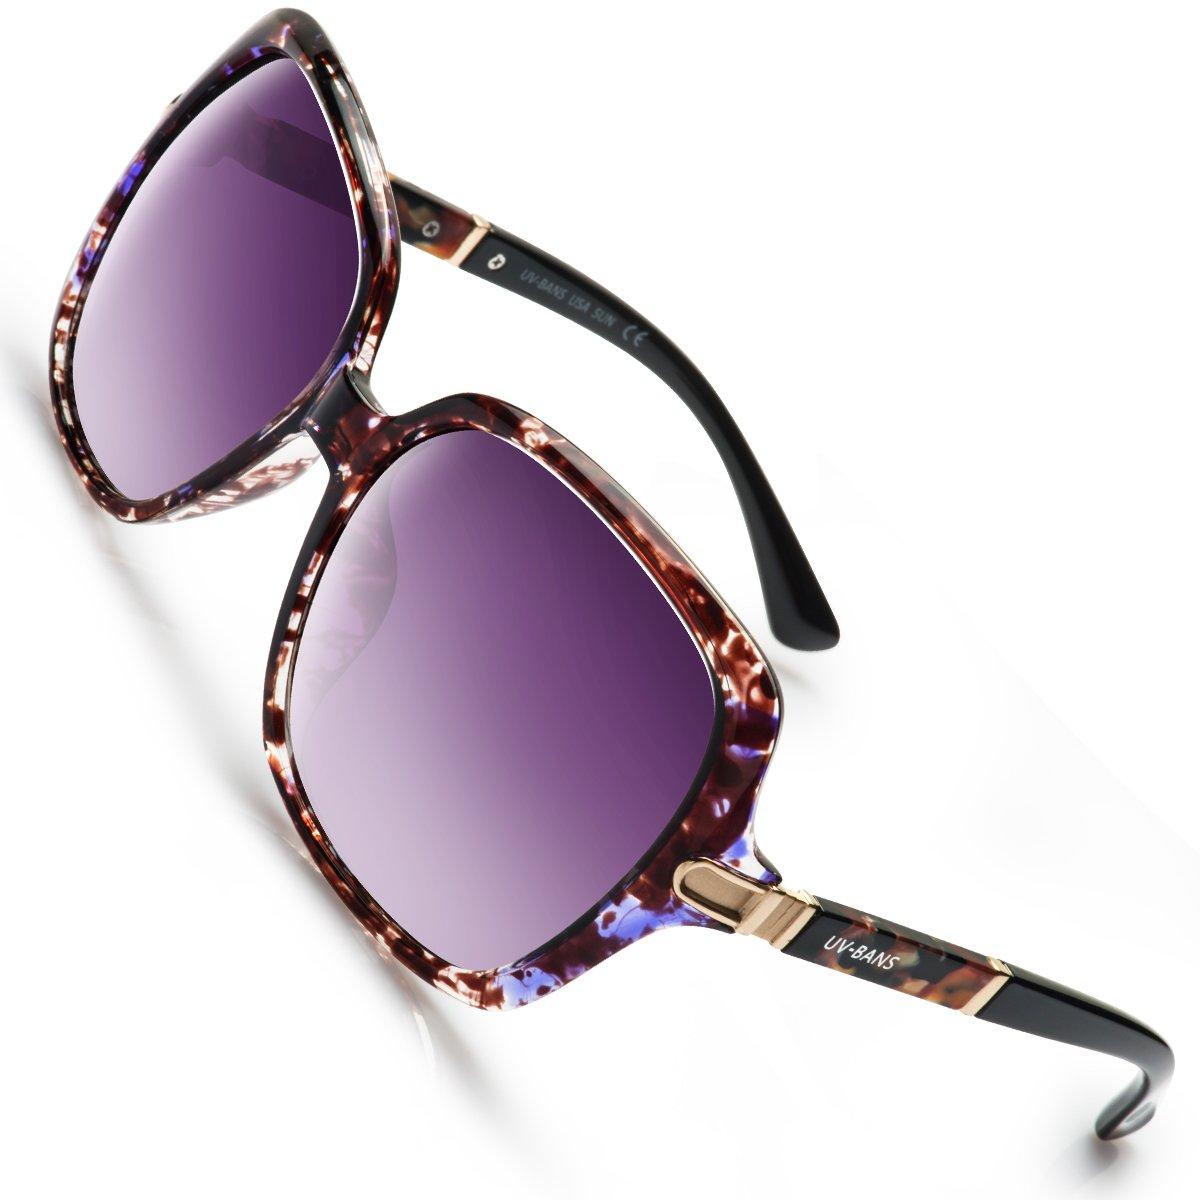 UV-BANS Women Oversized Street Fashion Designer Sunglasses Polarized UV400 Lens Holiday Gifts for Her (C-Purple Tortoiseshell Frame)